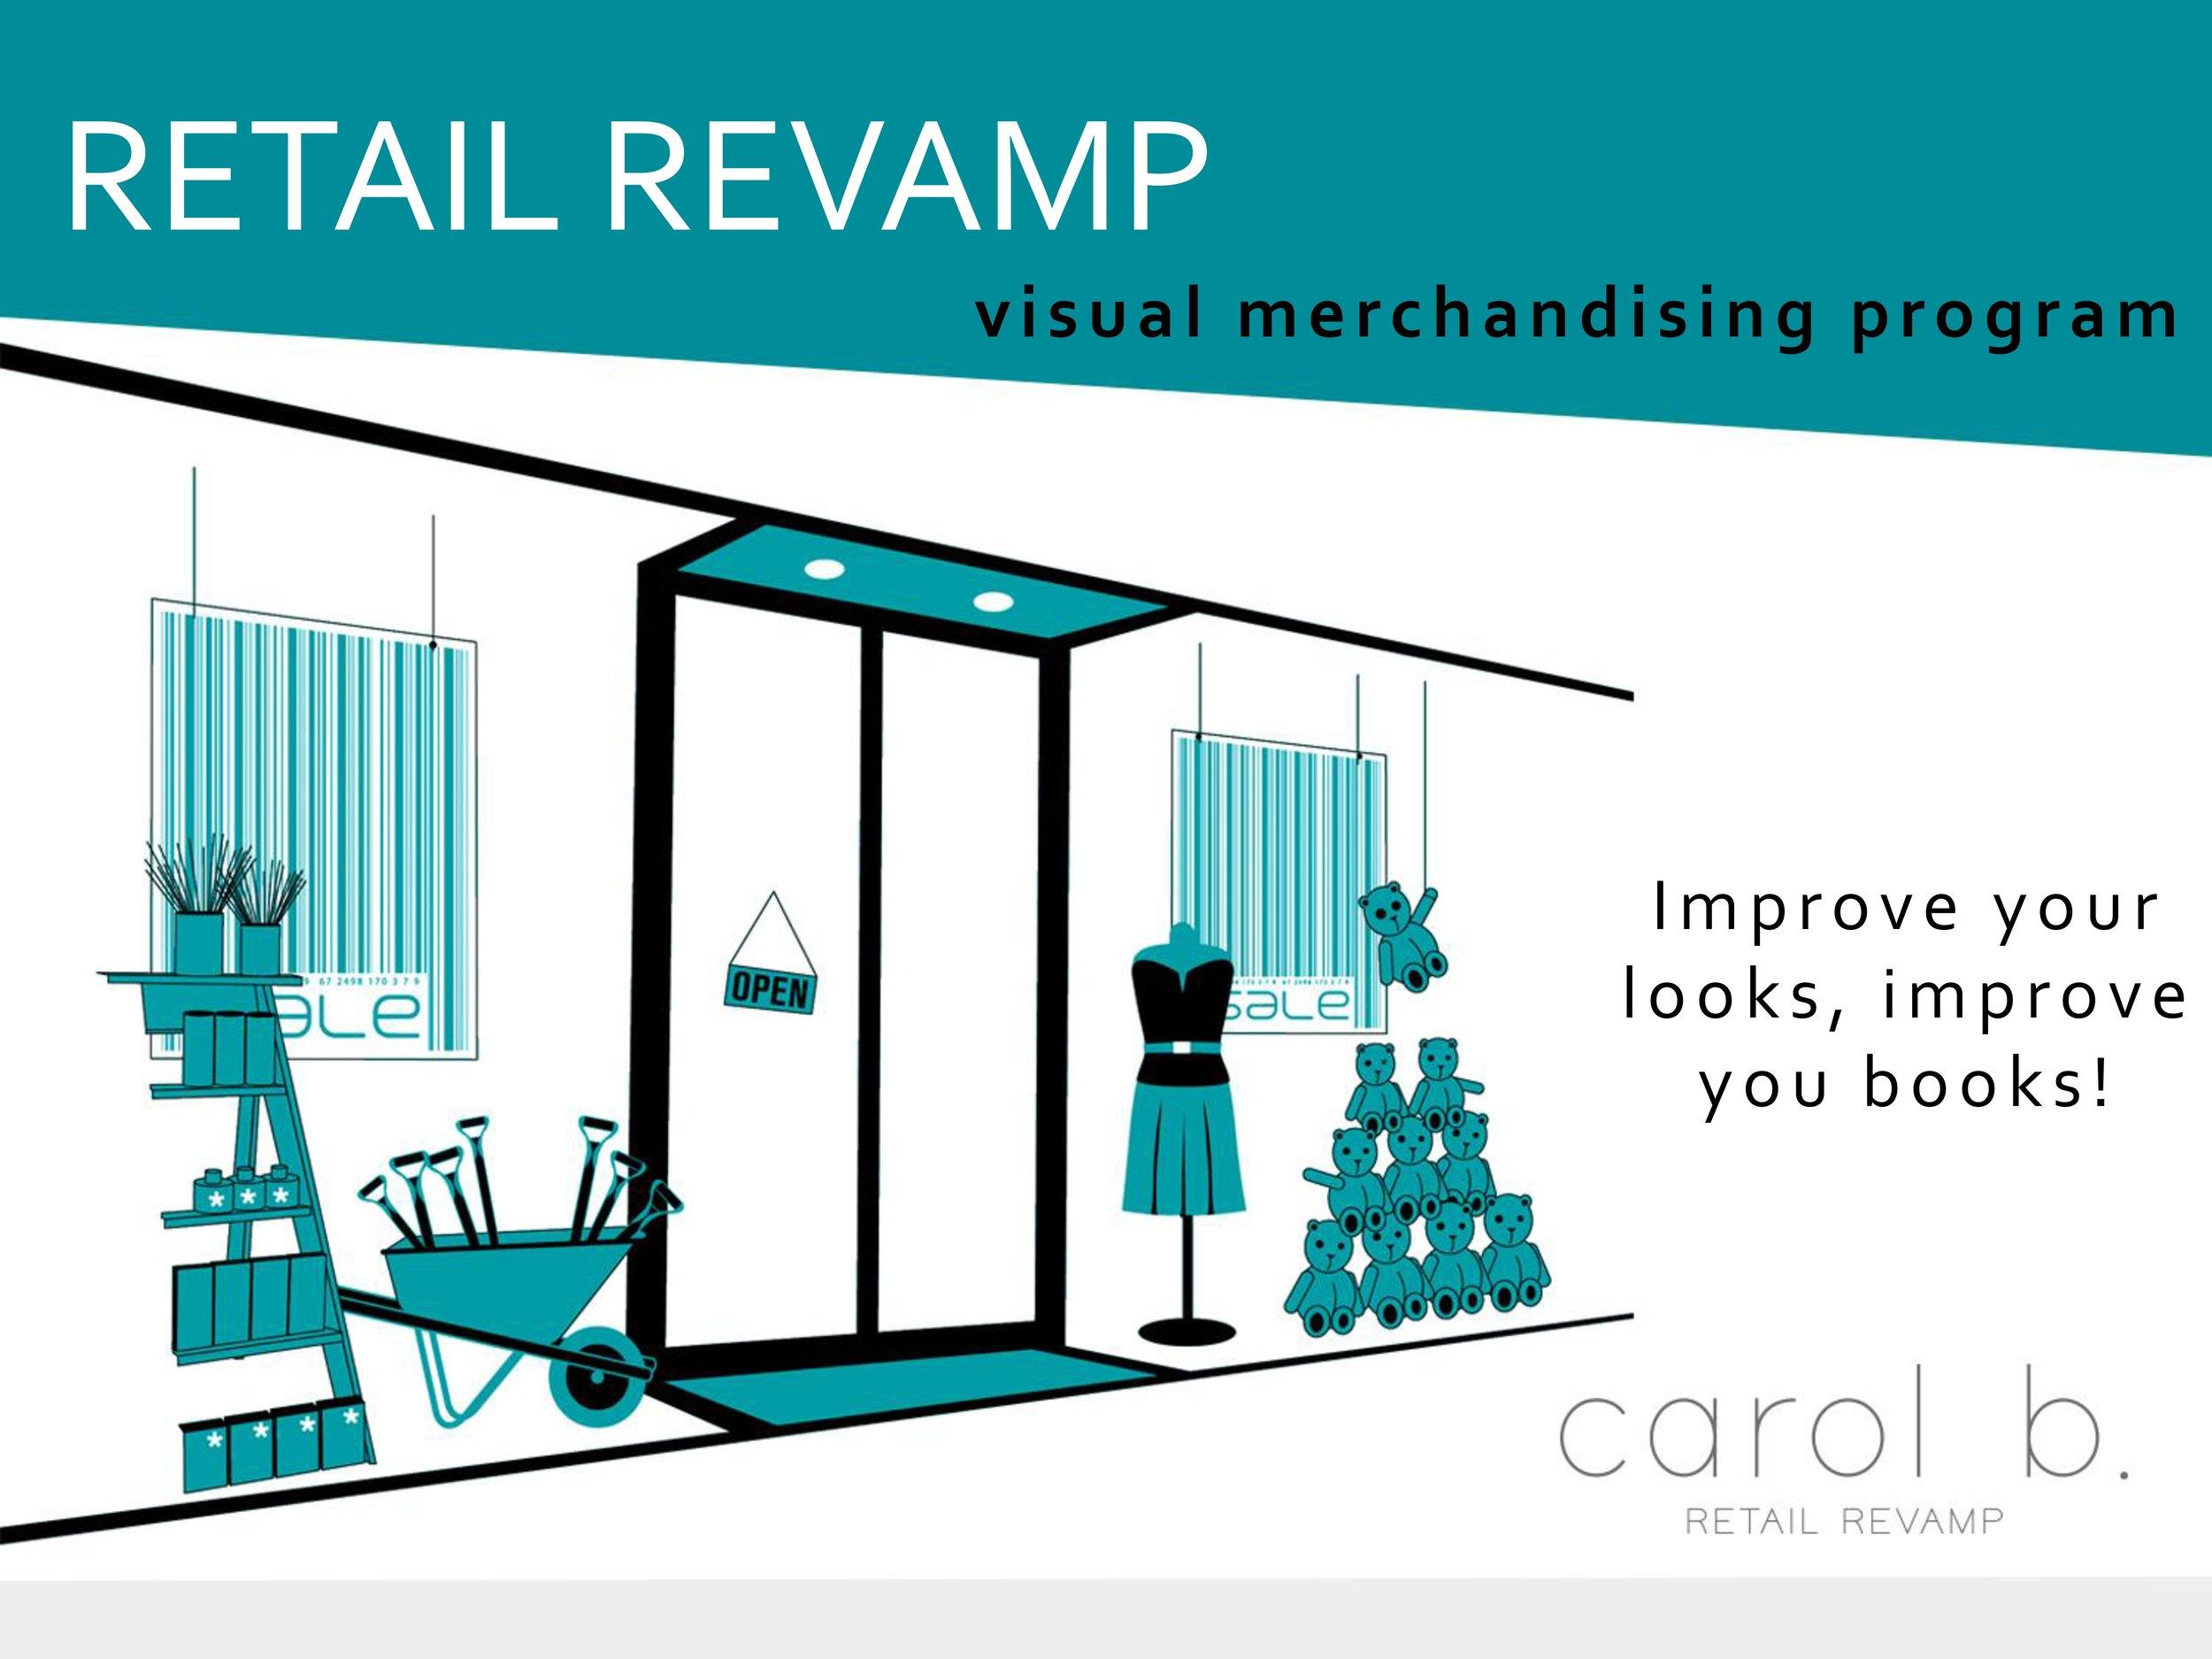 Carol b. Retail Revamp Visual Merchandising Educator